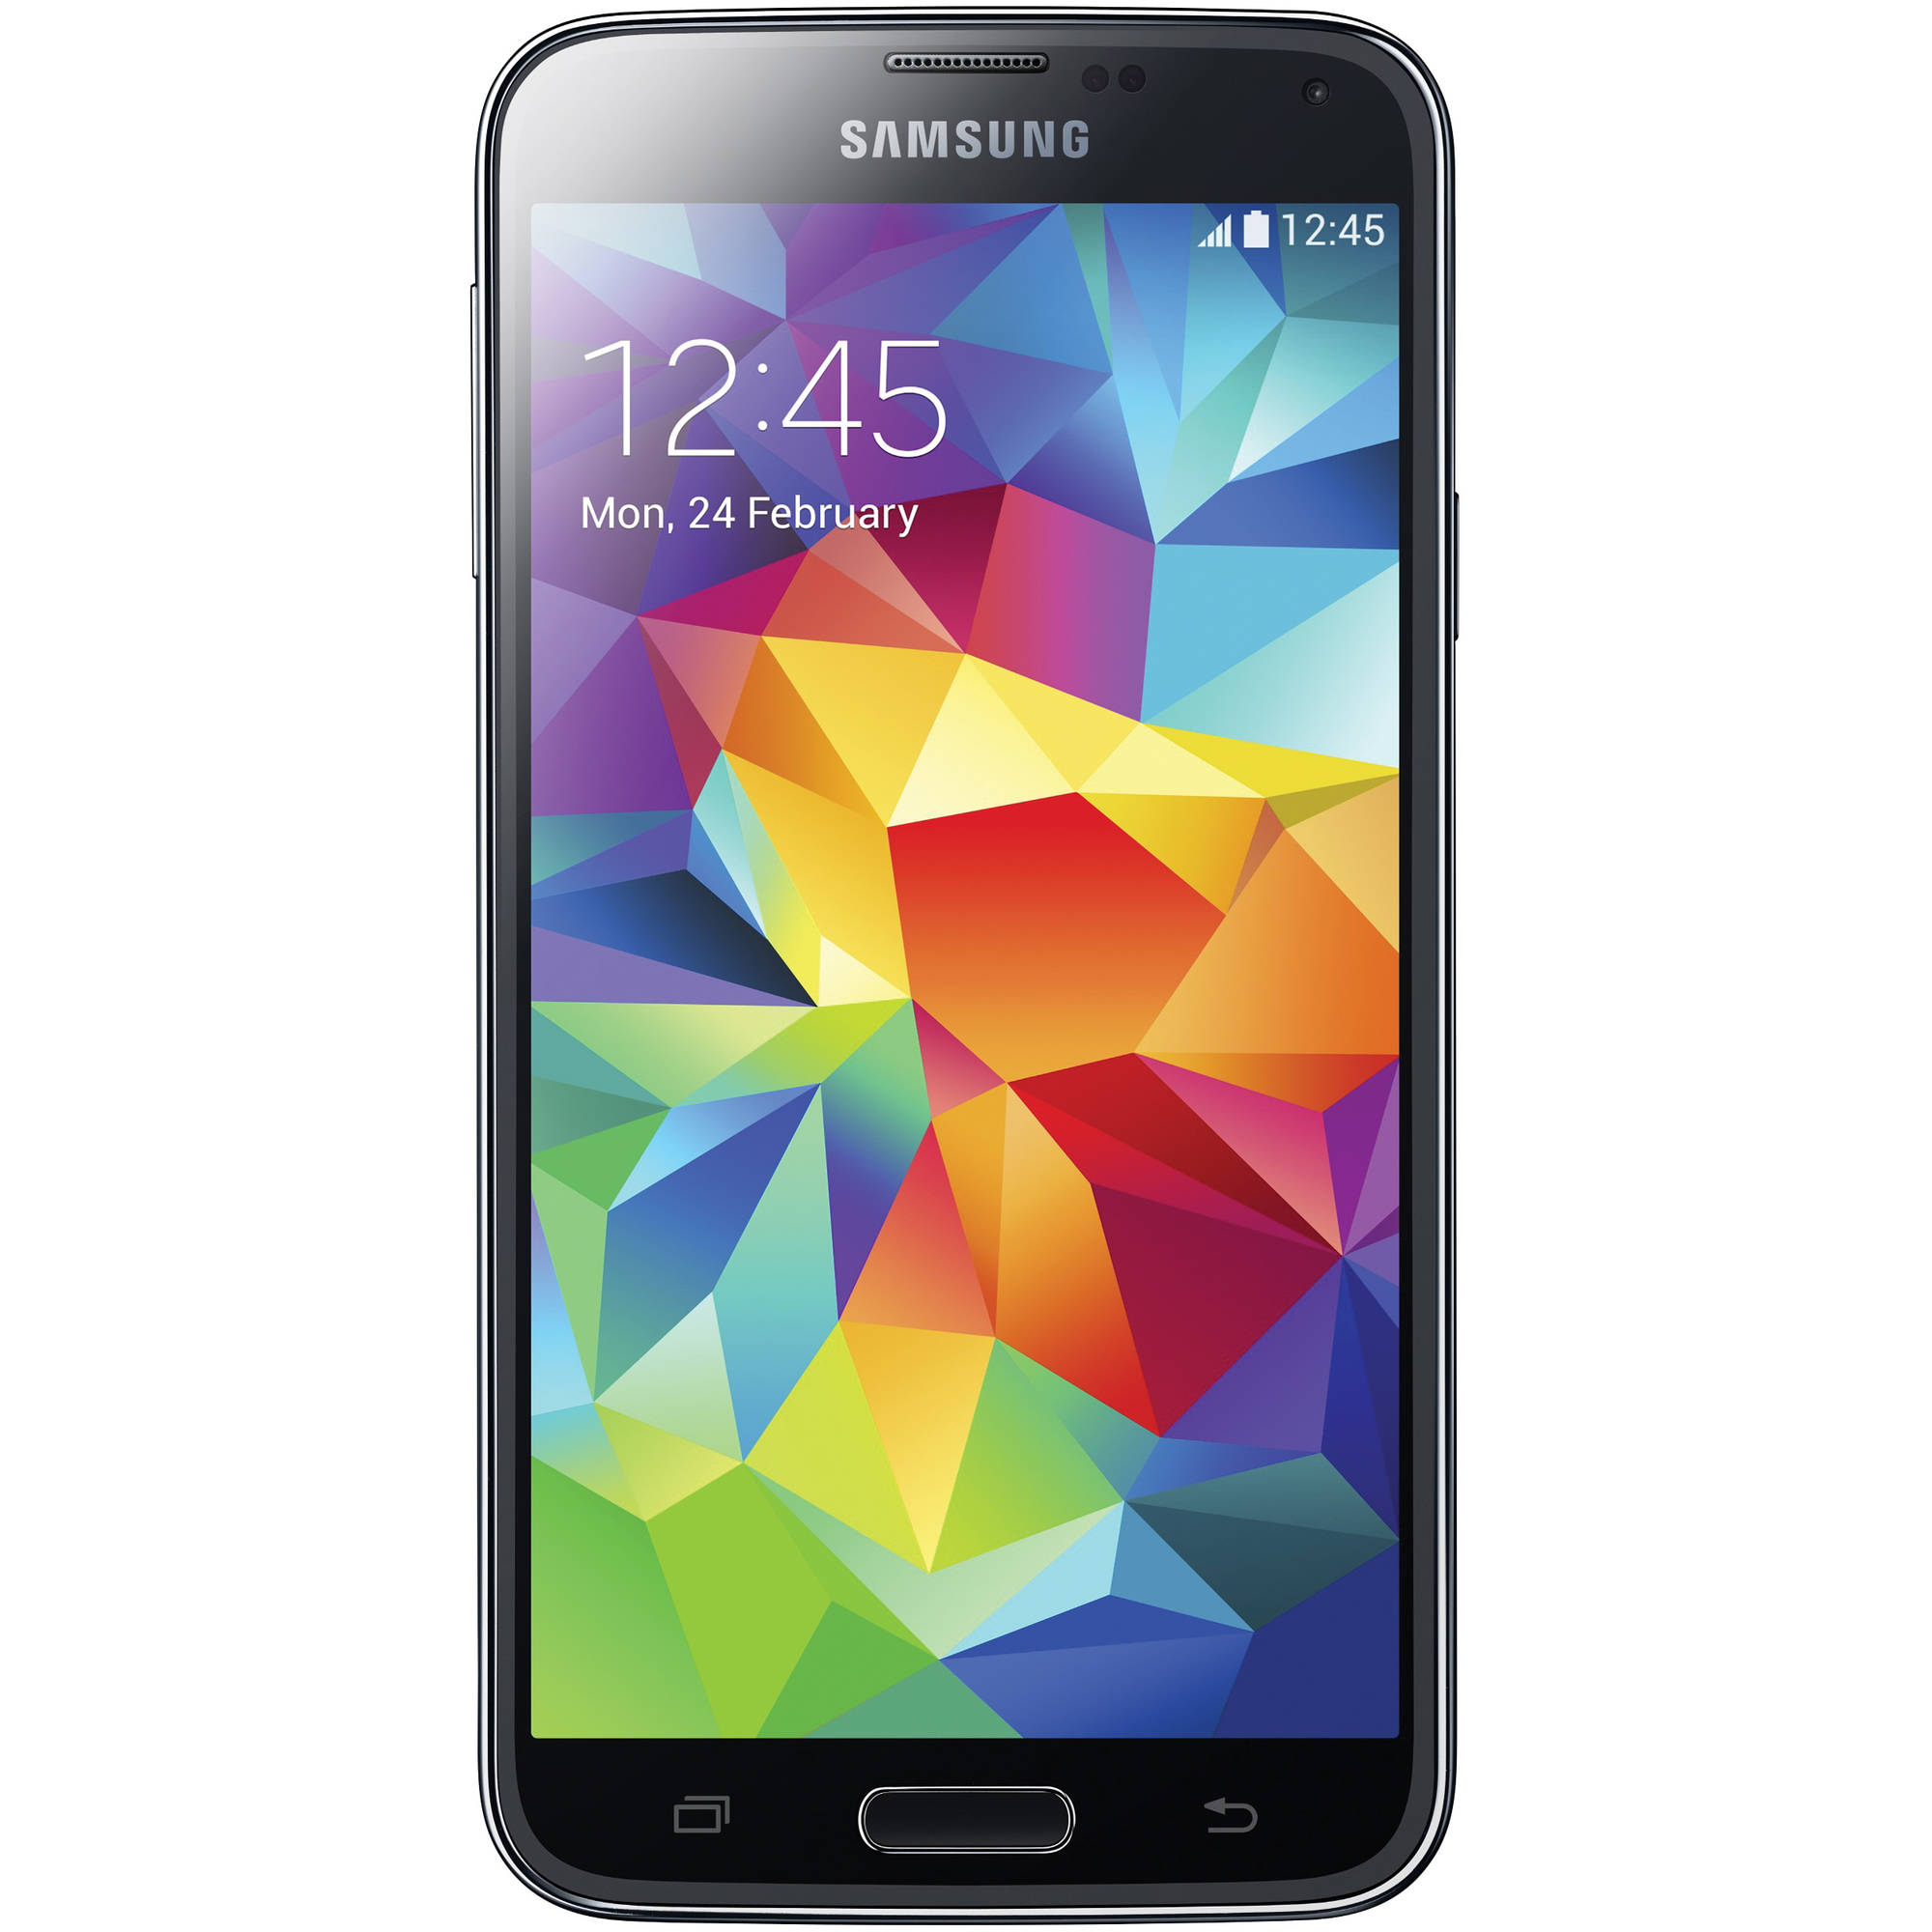 Galaxy S5 Mini Sim Karte.Samsung Galaxy S5 Sm G900f 16gb Smartphone Unlocked Black